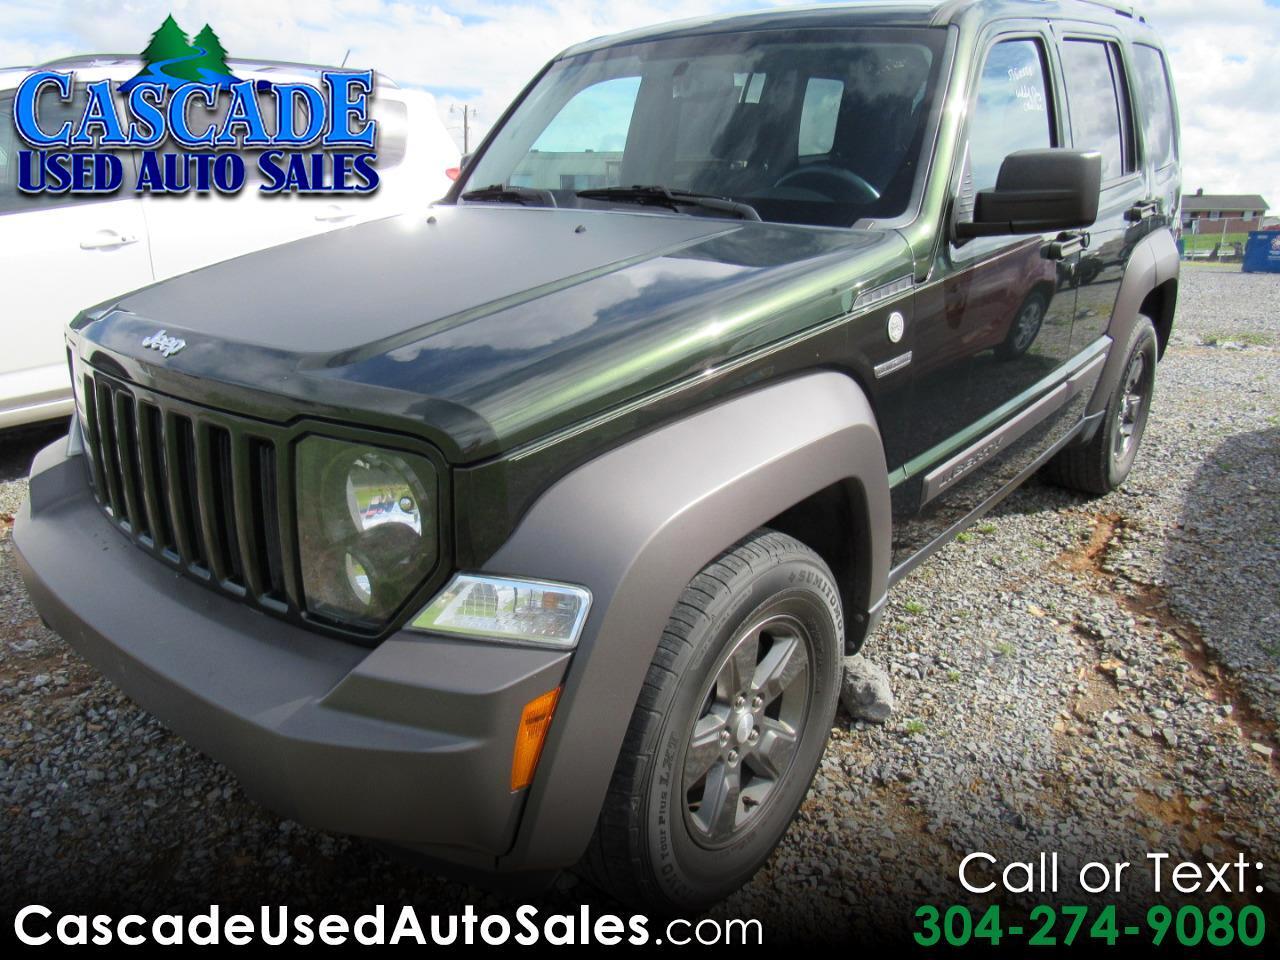 2011 Jeep Liberty Renegade 4WD